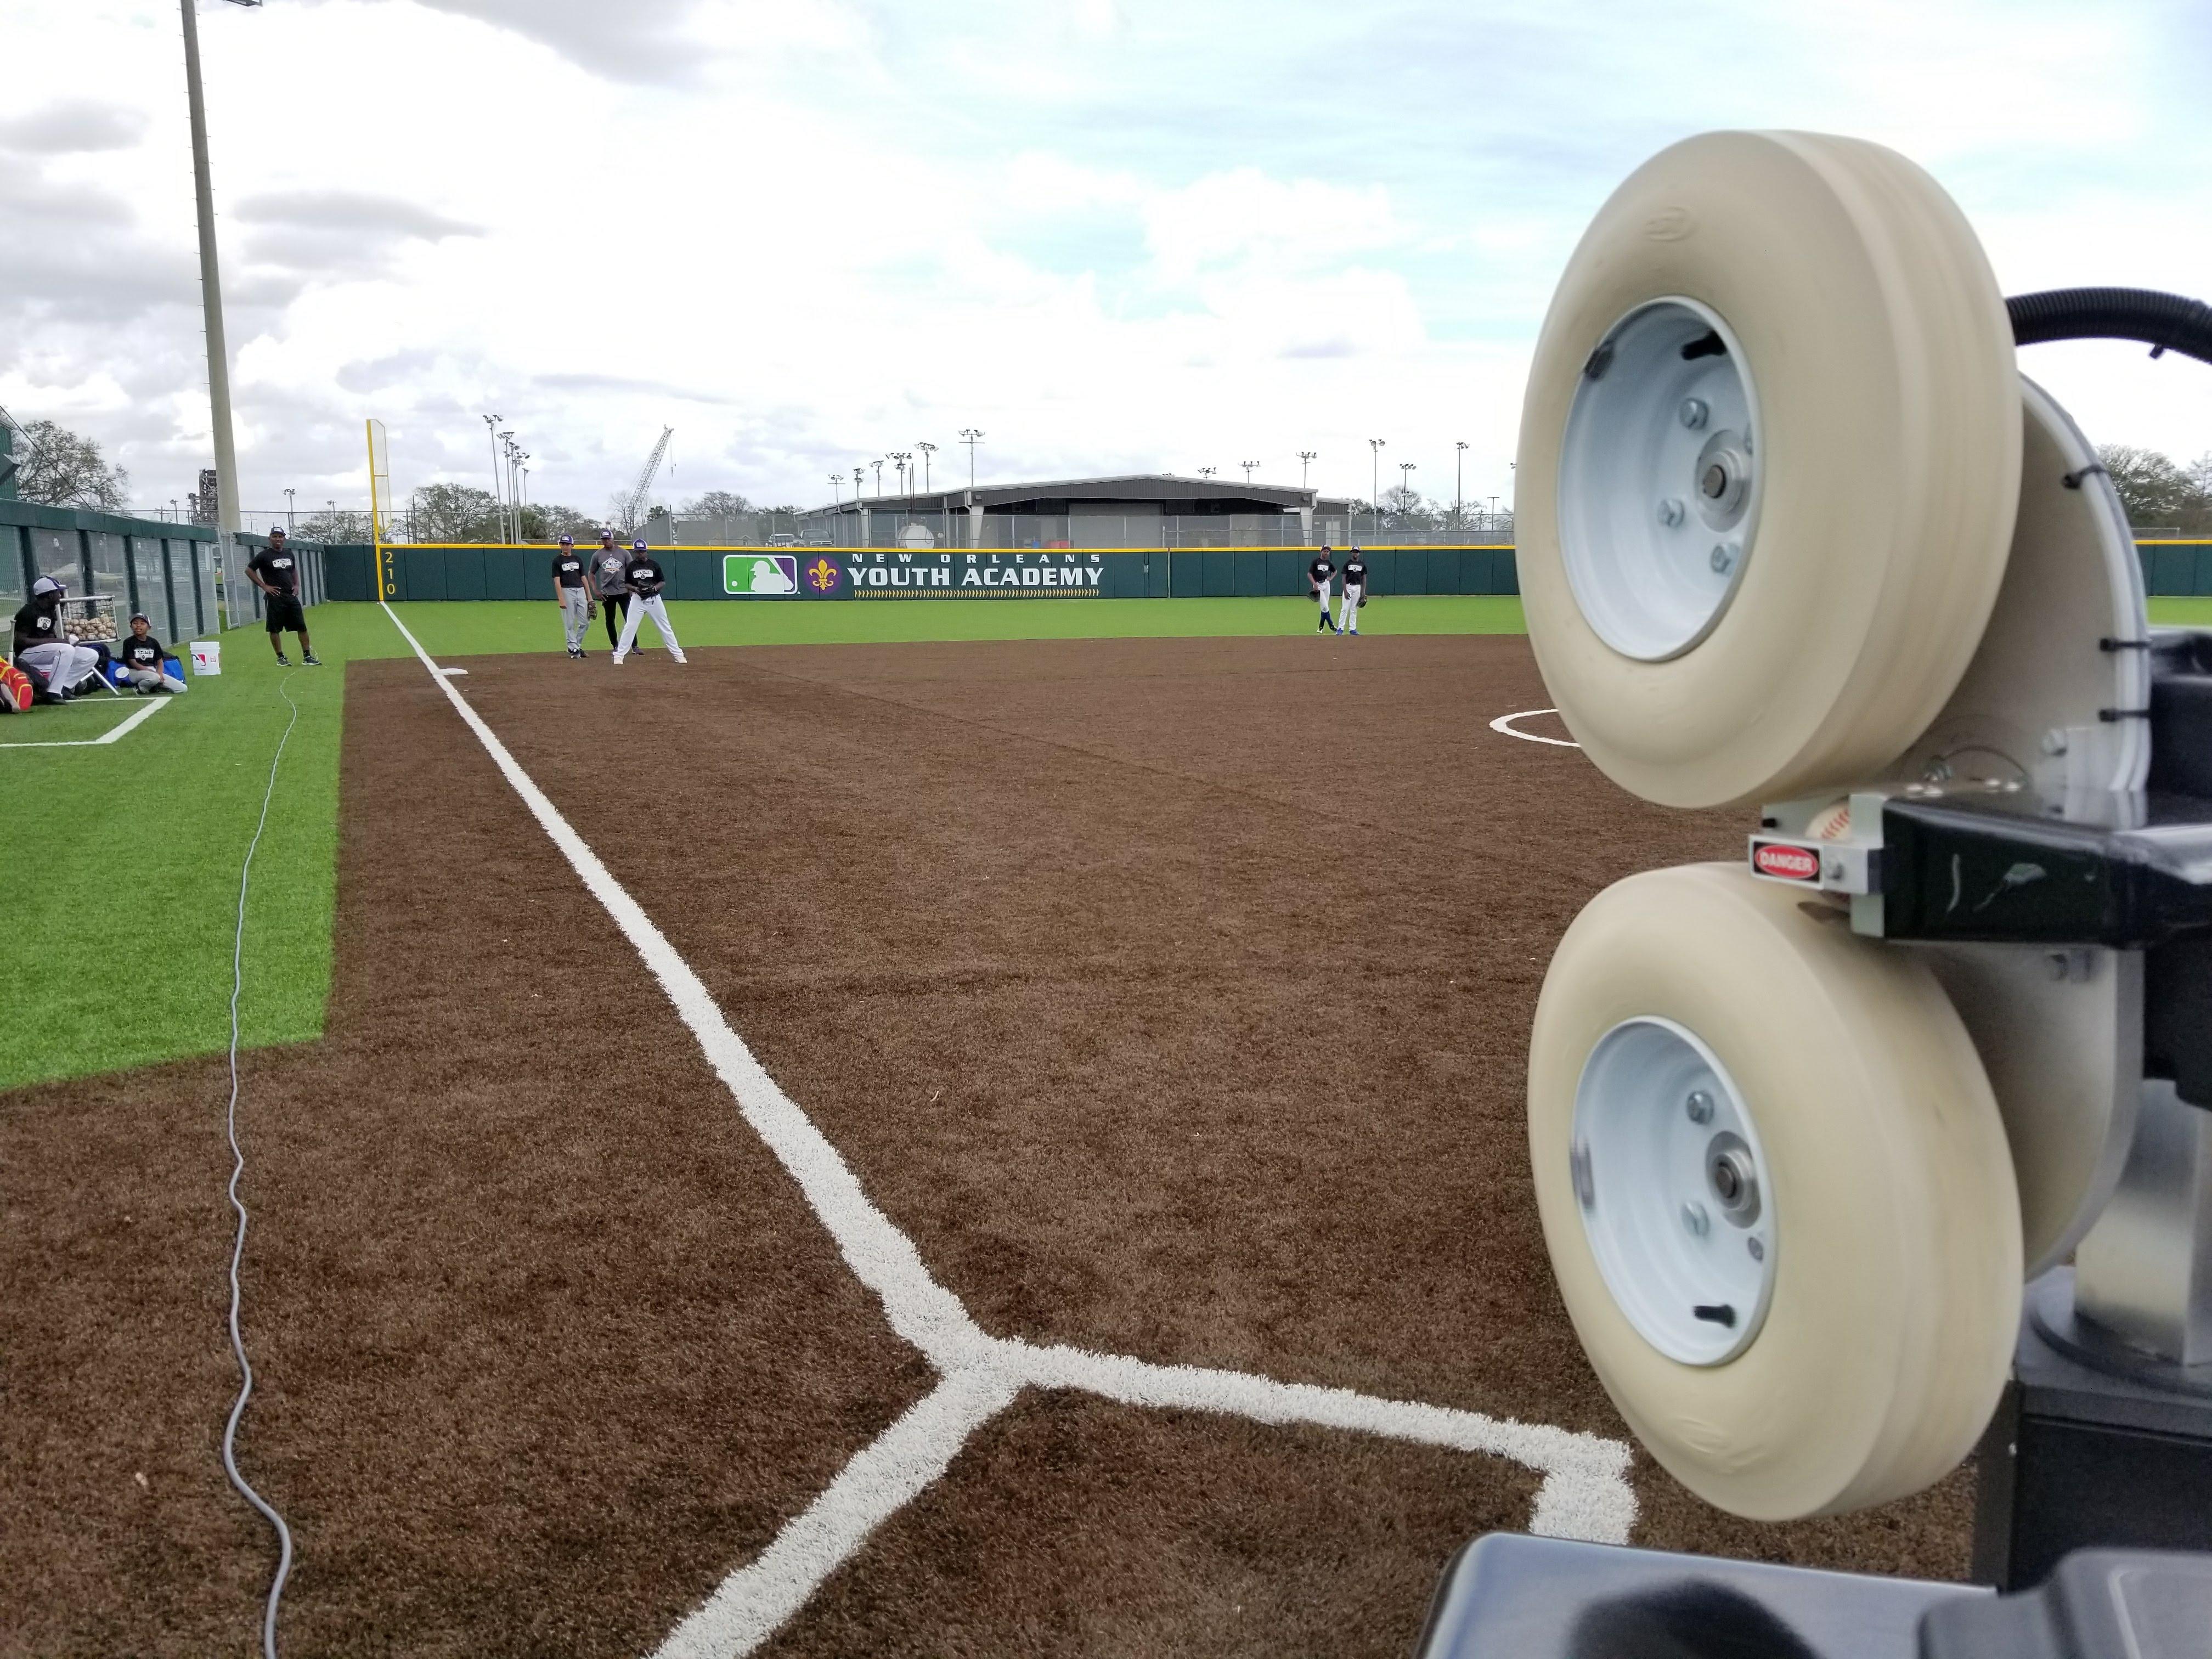 MLB Youth Academy NOLA FungoMan